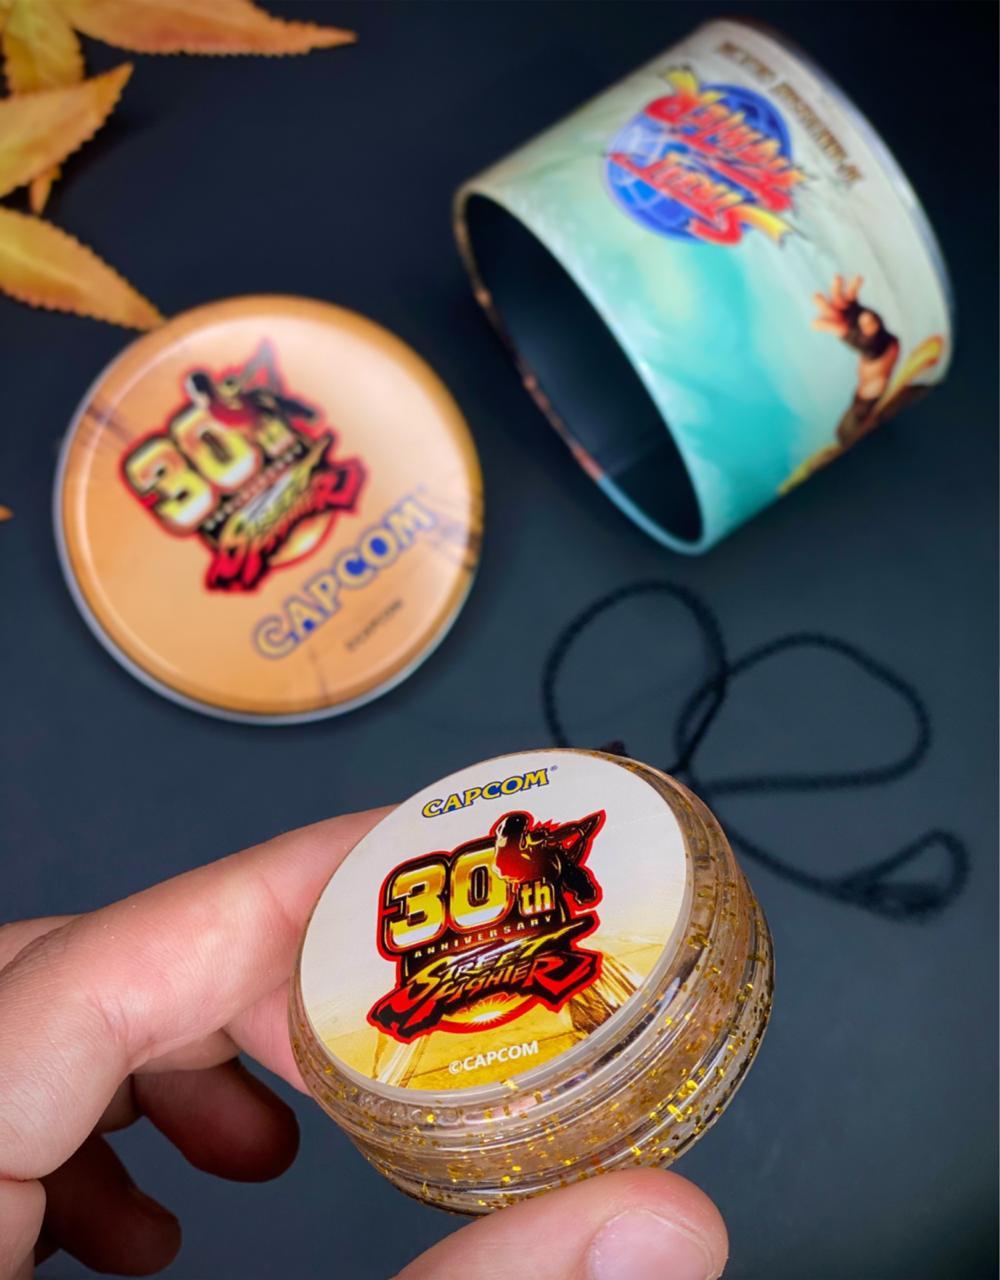 Ioiô Luxo Profissional Street Fighter 30th - Capcom